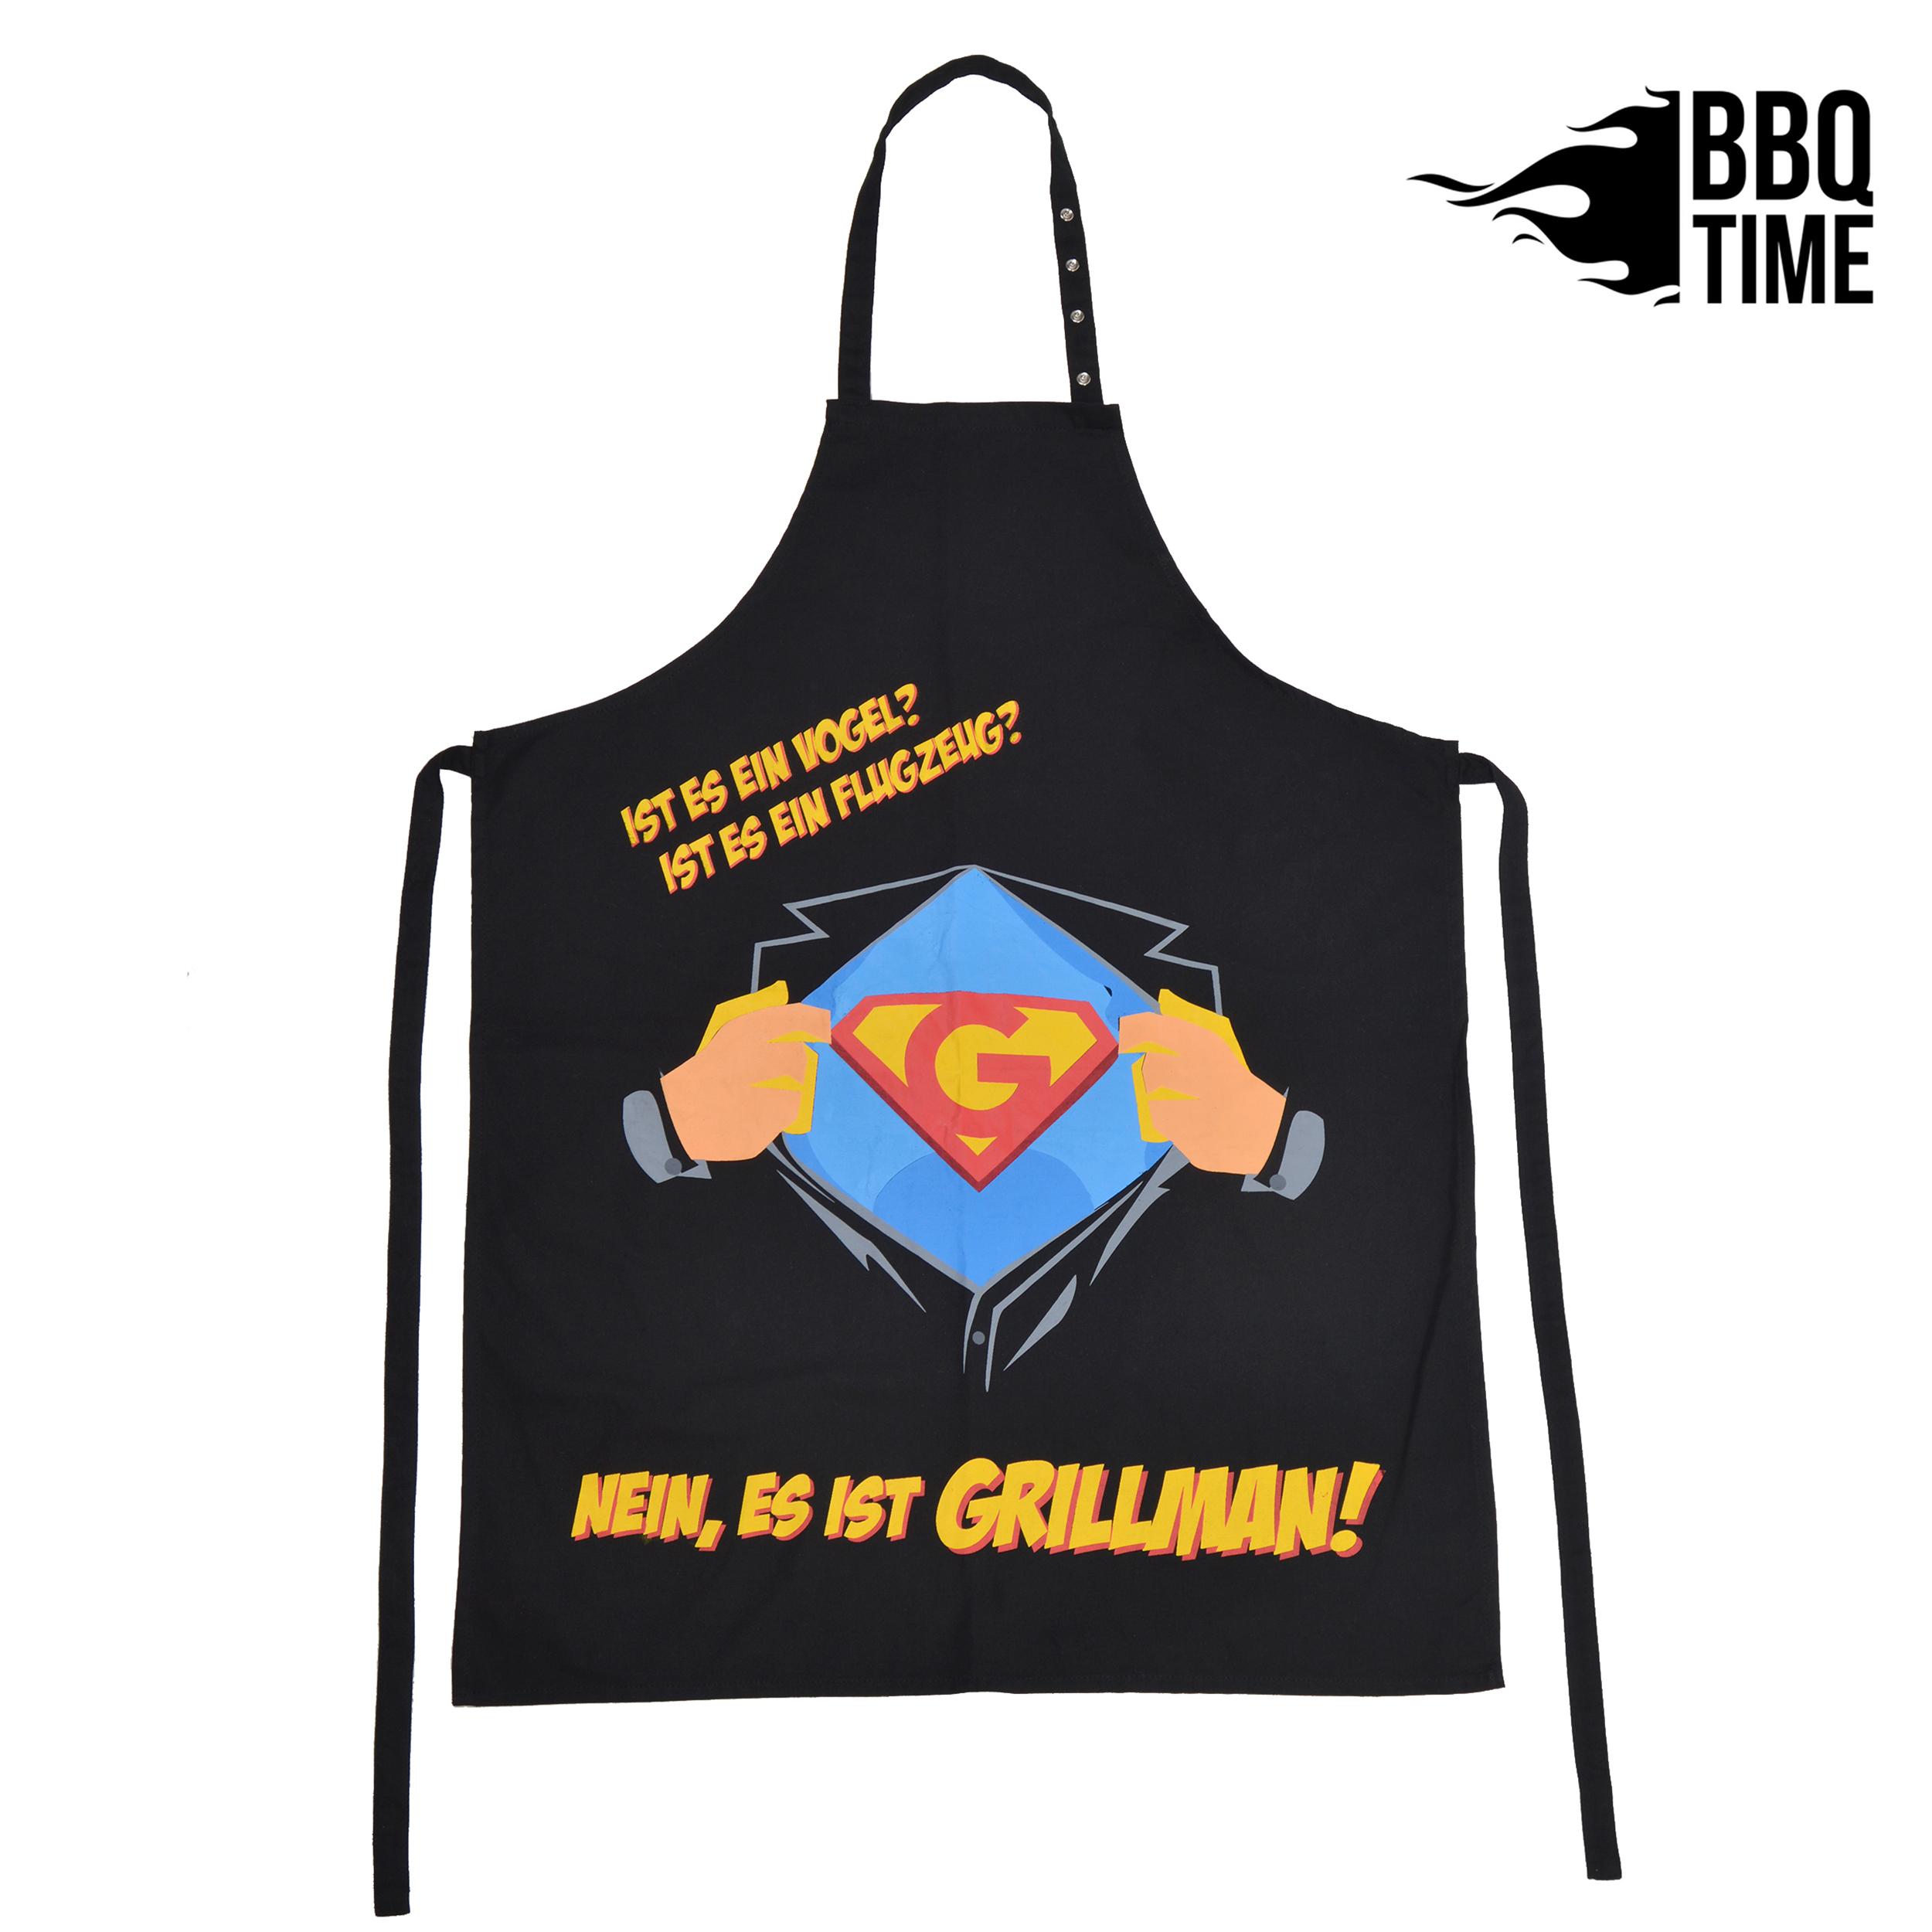 Grillschürze BBQ TIME - Grillmann